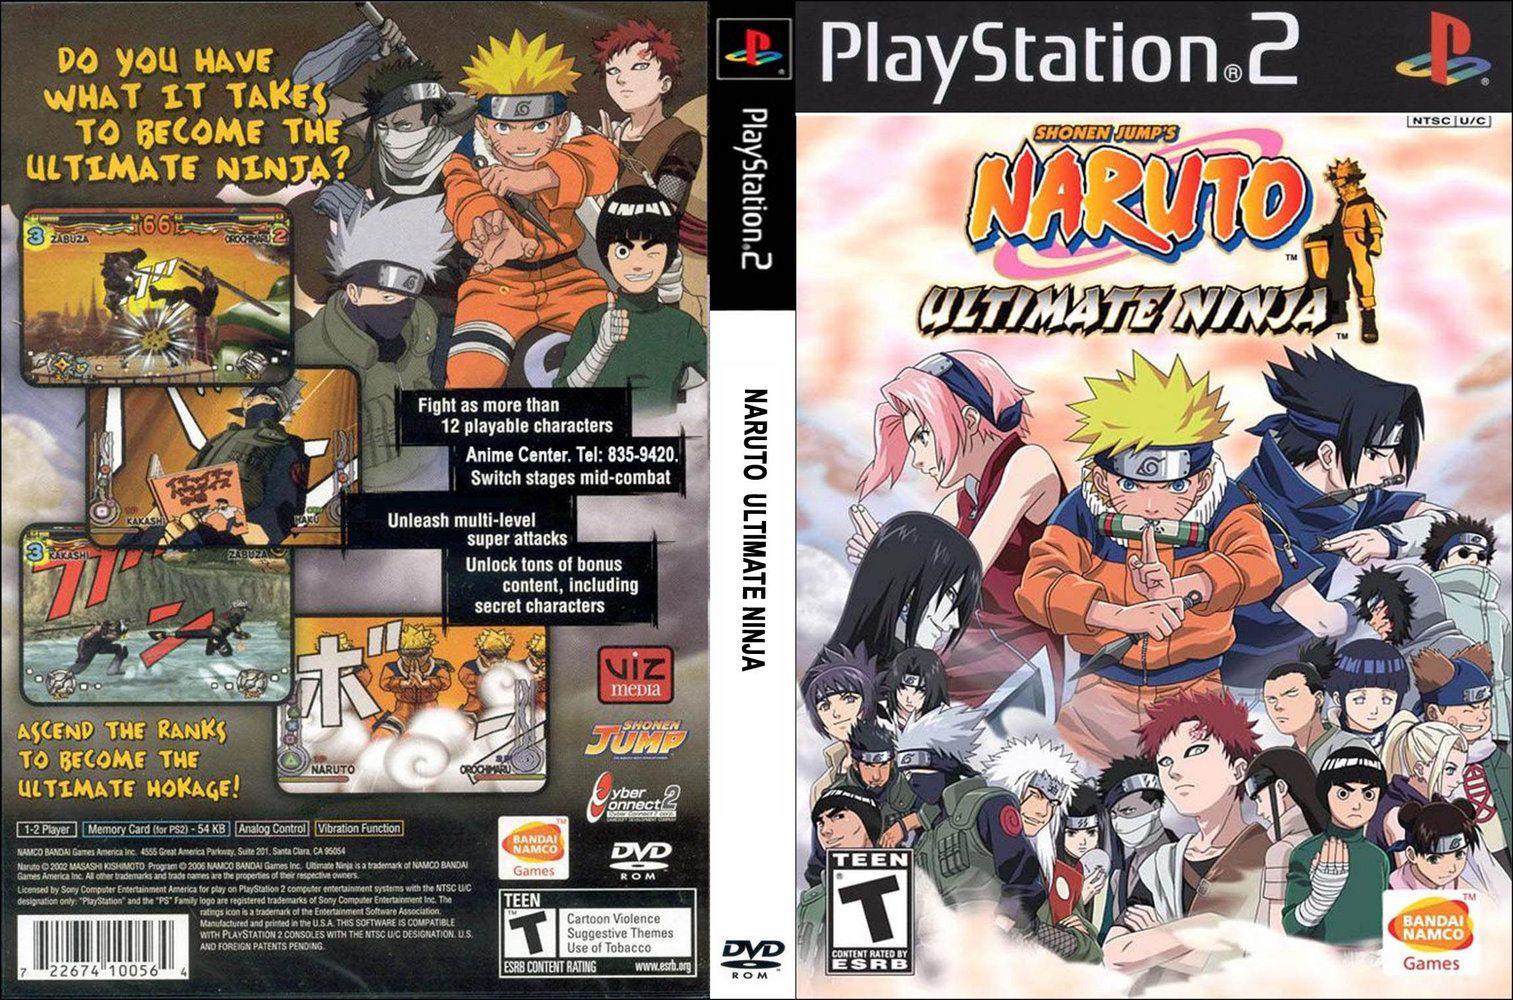 Naruto Ultimate Ninja 1 [Game Giả lập]